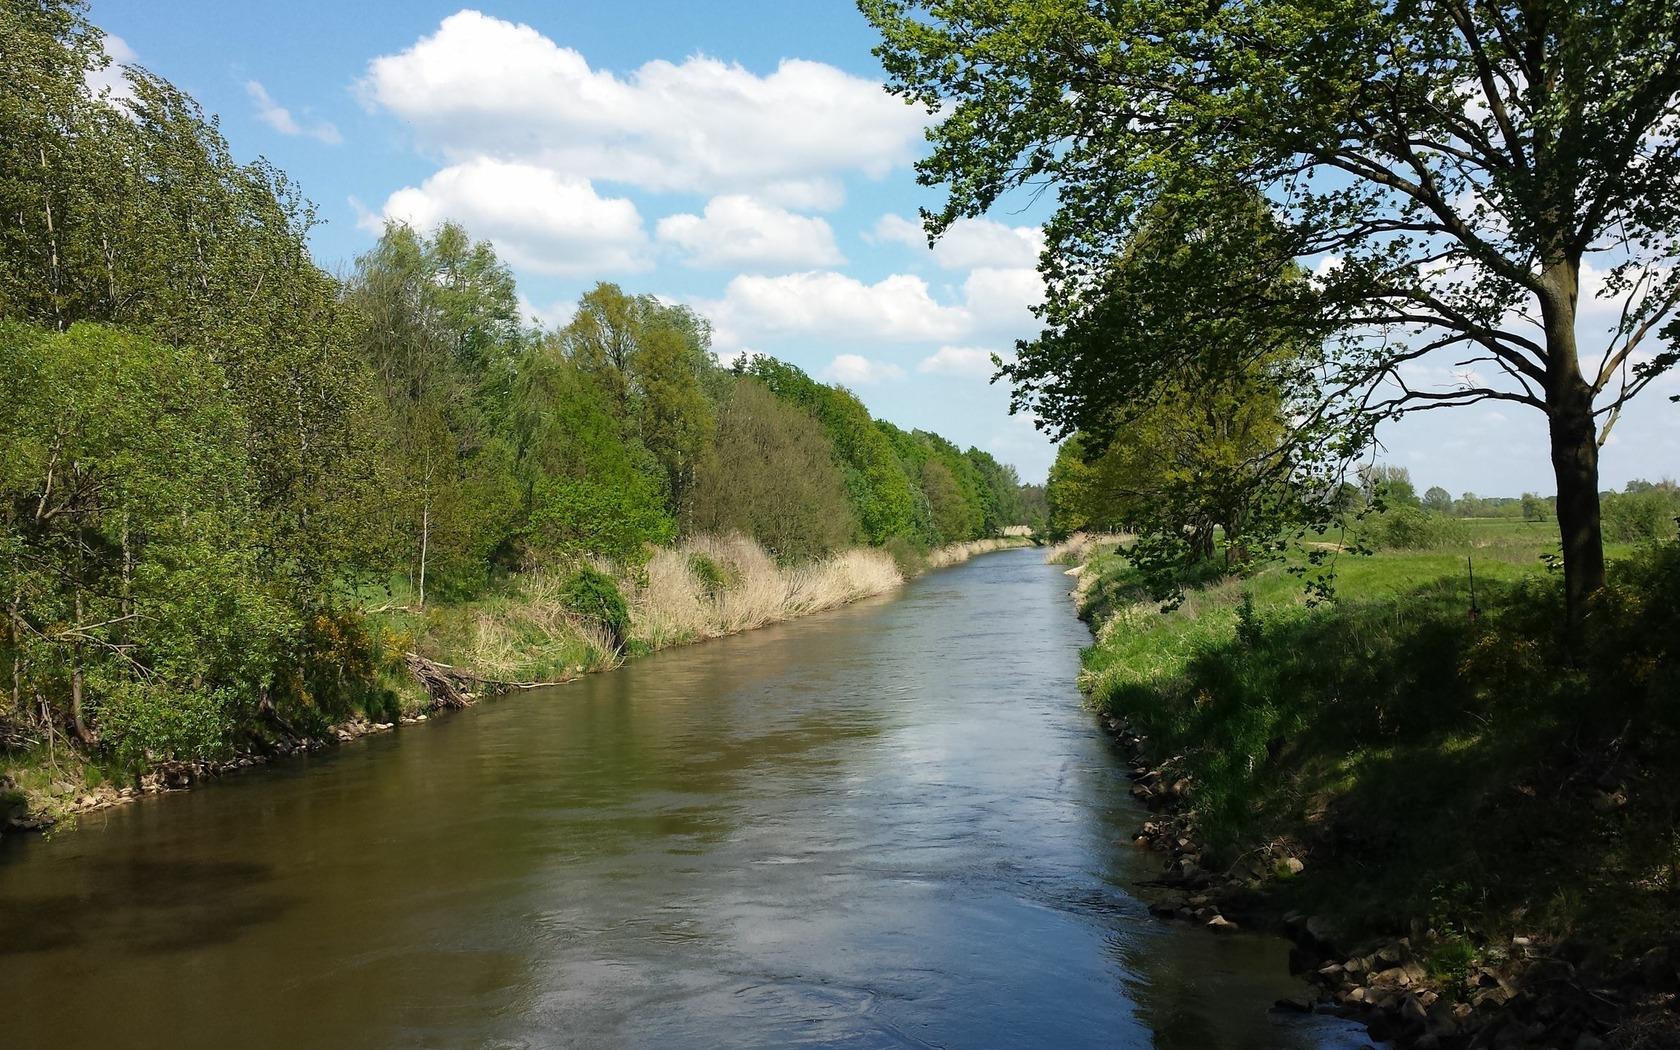 Kanal hinter dem Wasserkraftwerk Grießen, Foto: P. Neumann - Tourismusverband Niederlausitz e.V.